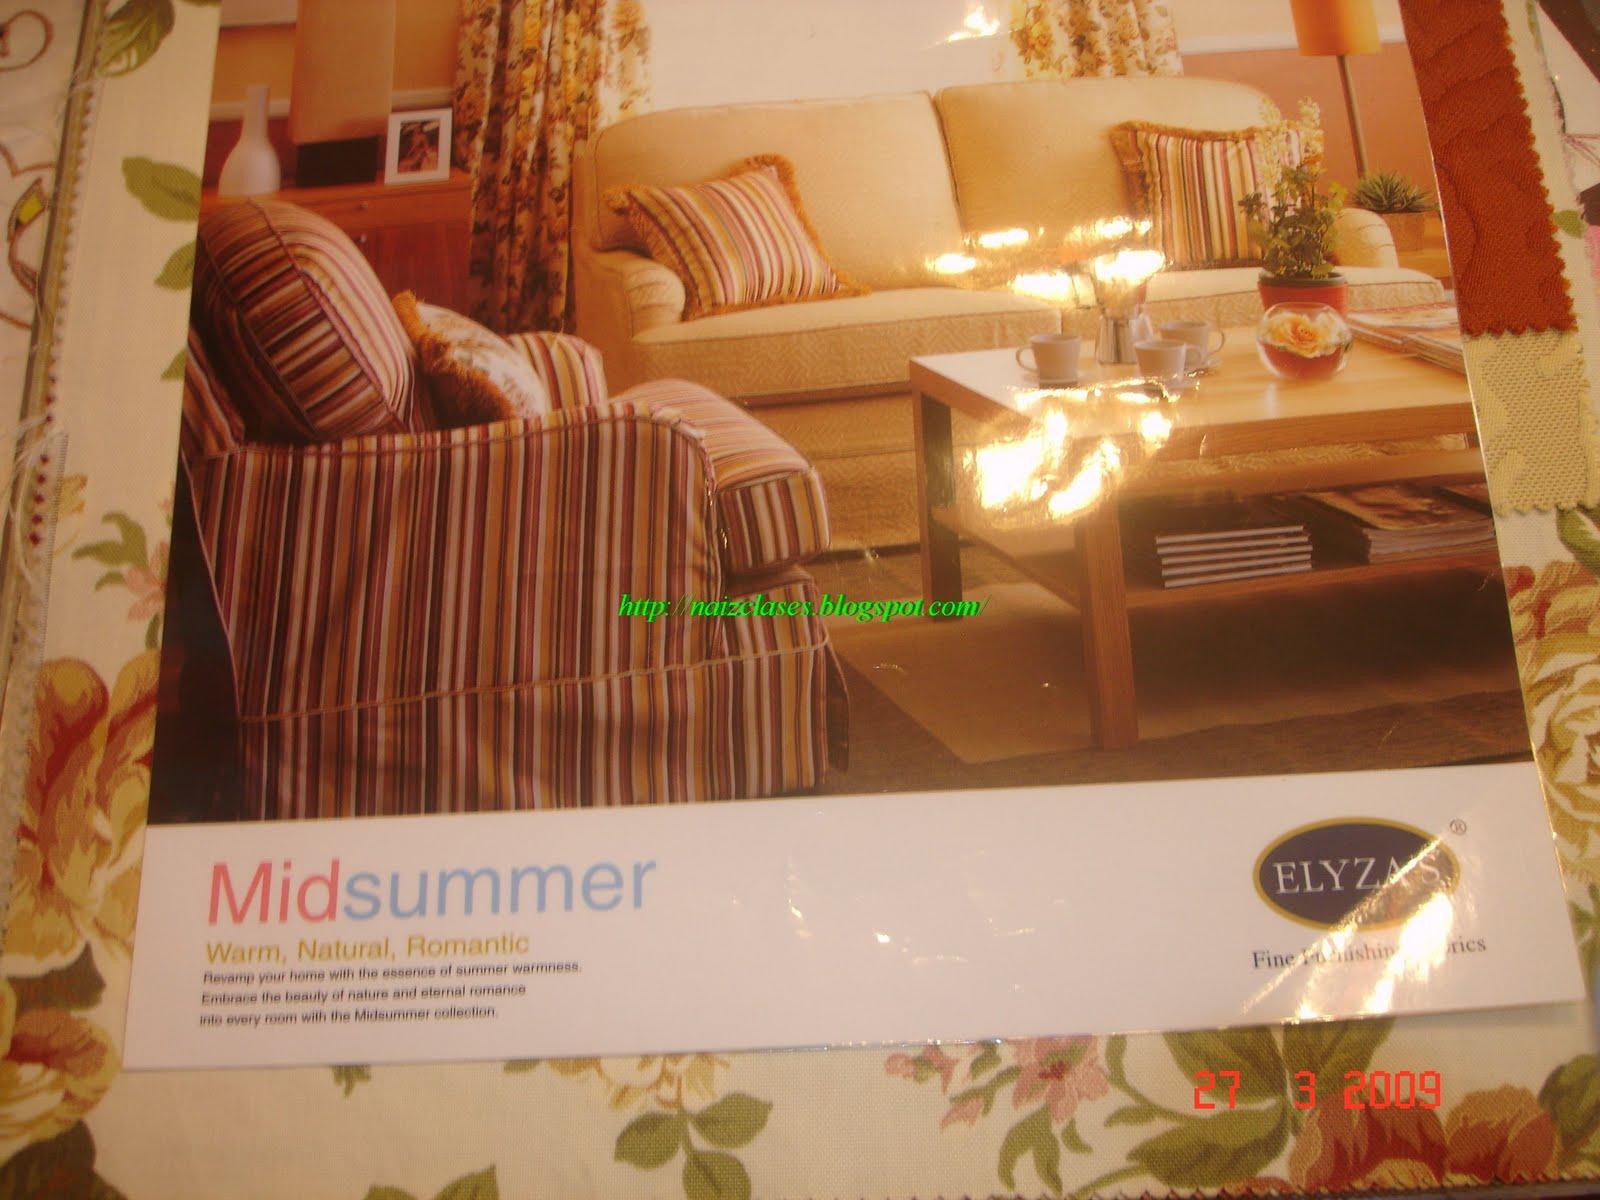 fabrik langsir elyza fabrik langsir pilihan kini may 2010. Black Bedroom Furniture Sets. Home Design Ideas